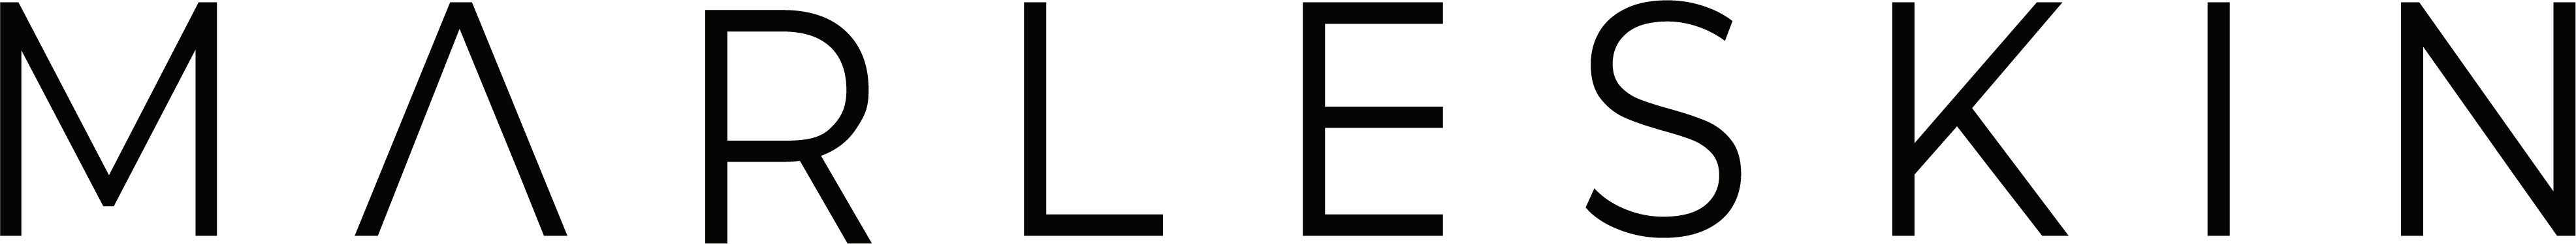 marleskin text logo